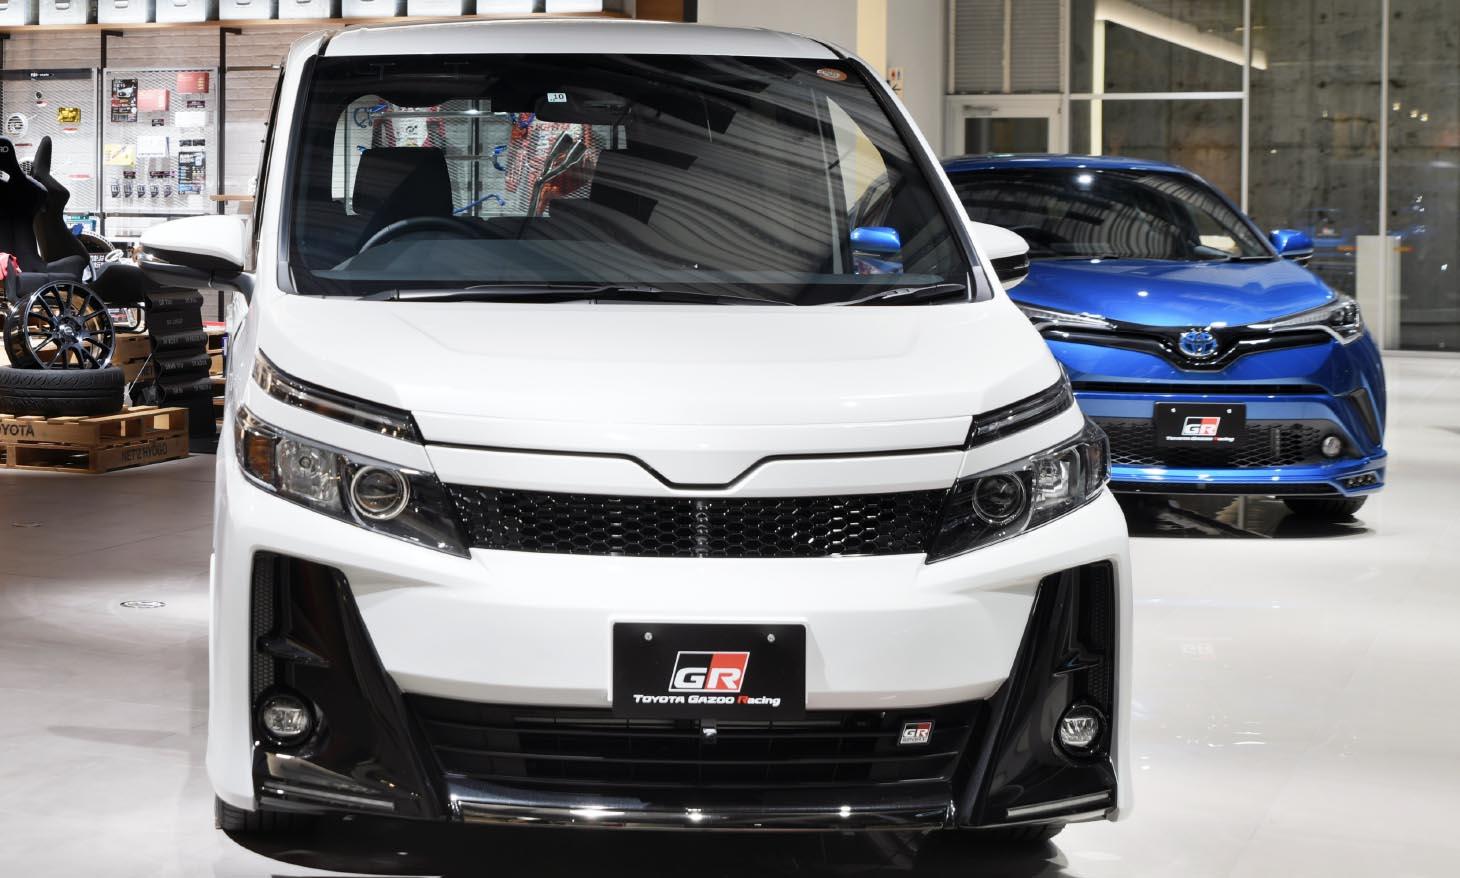 GR車展示・販売